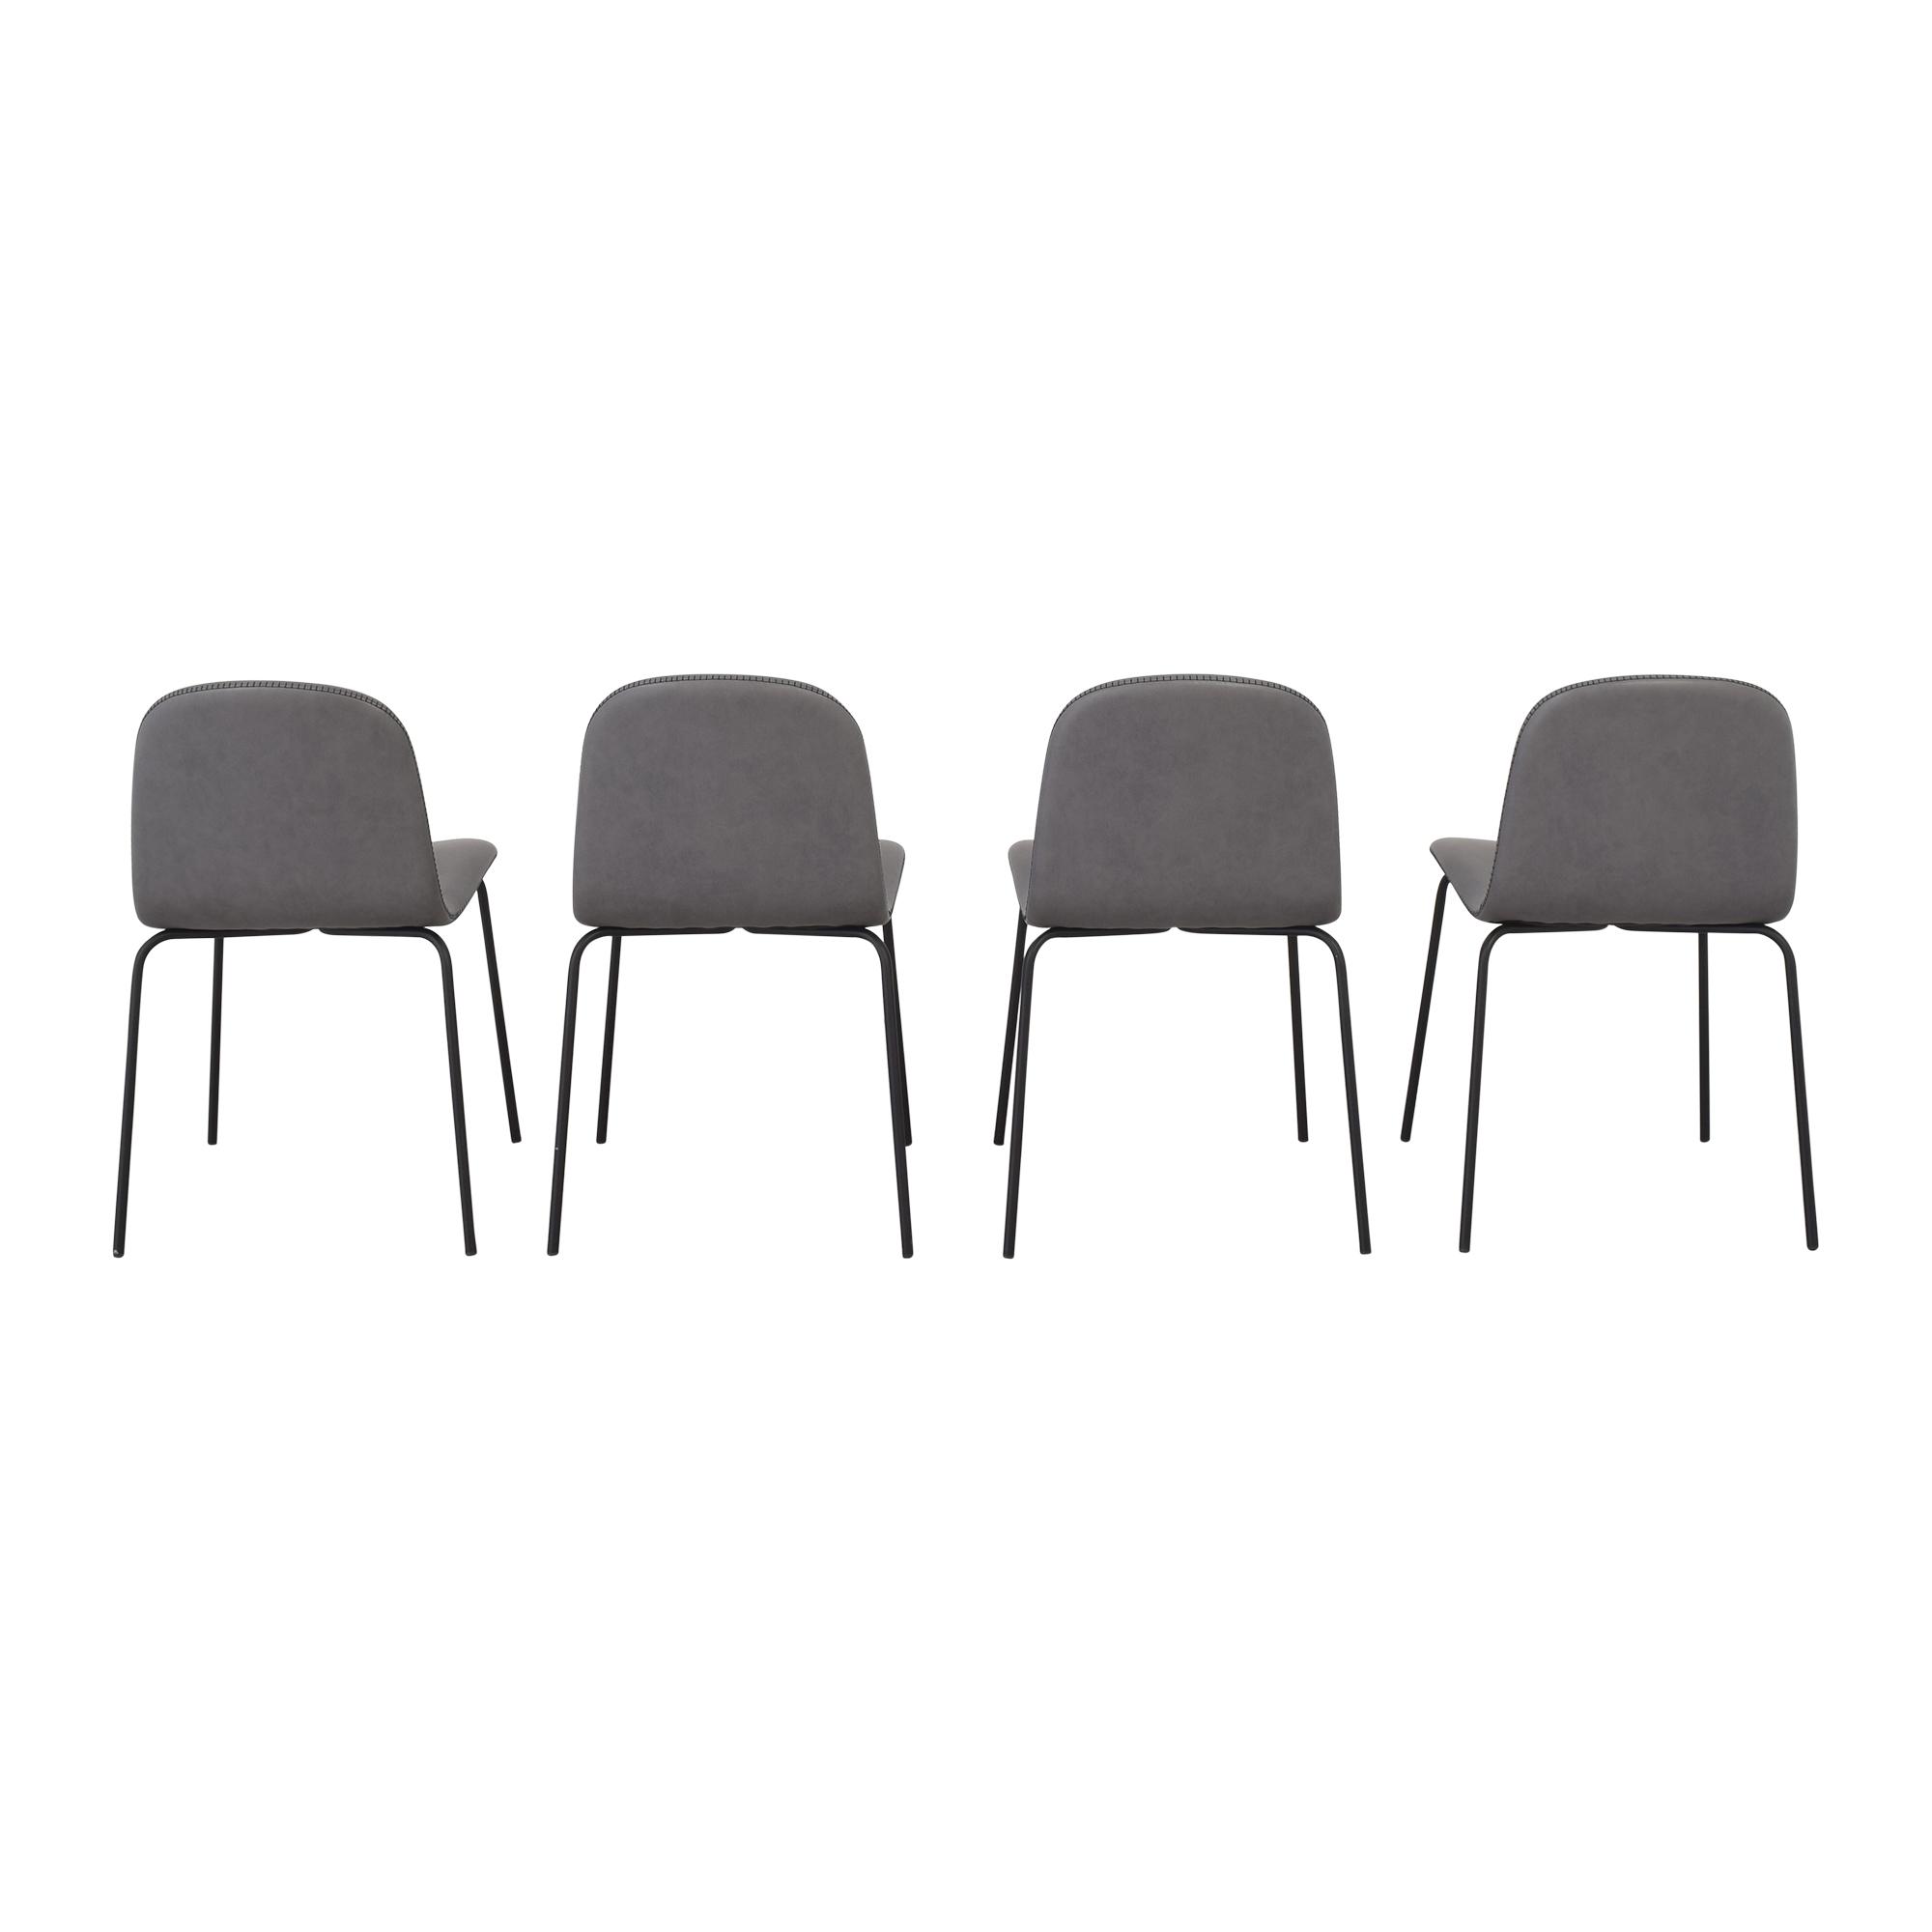 CB2 CB2 Primitivo Grey Chairs second hand